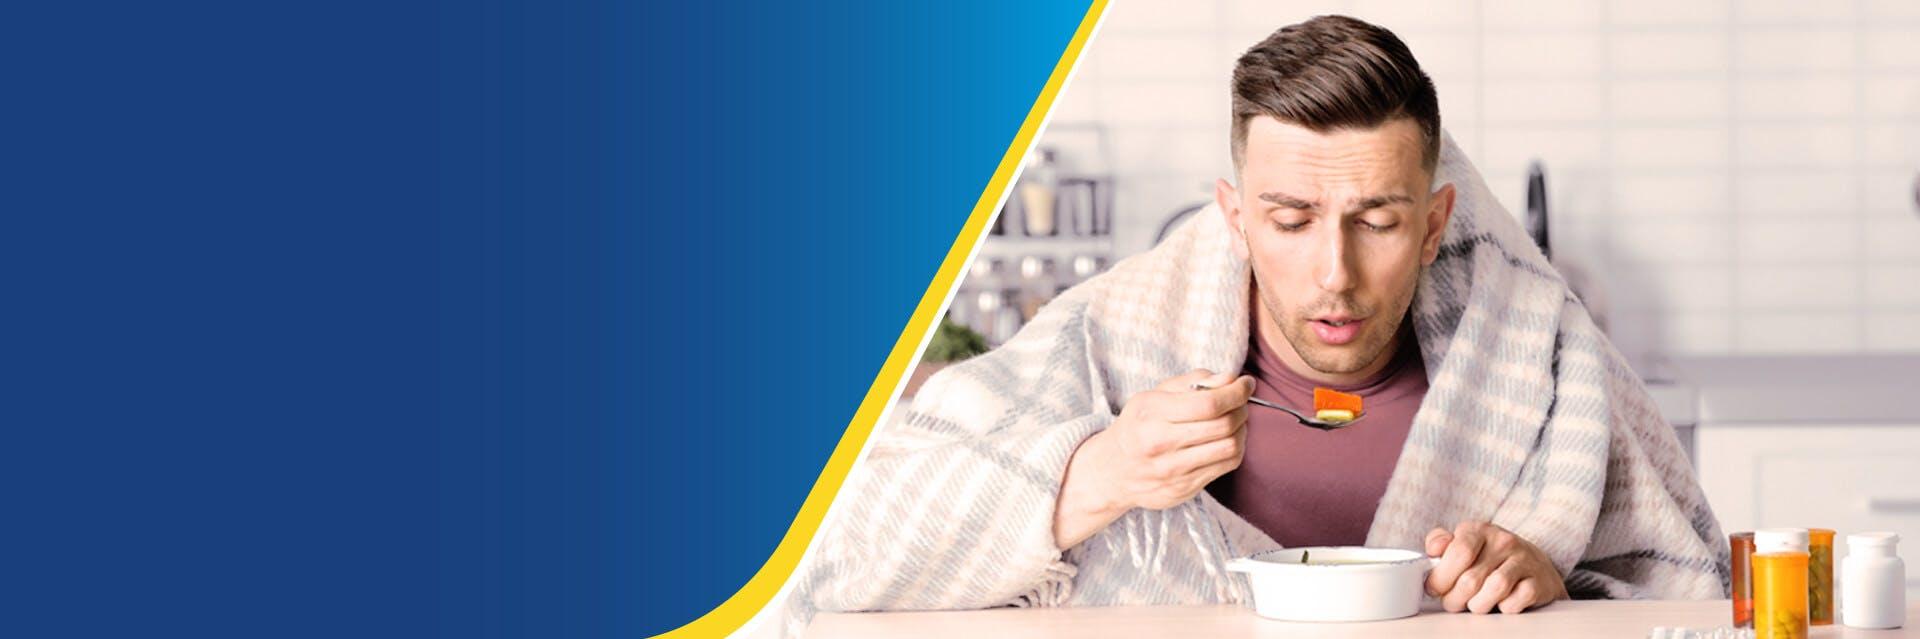 Sick man eating soup